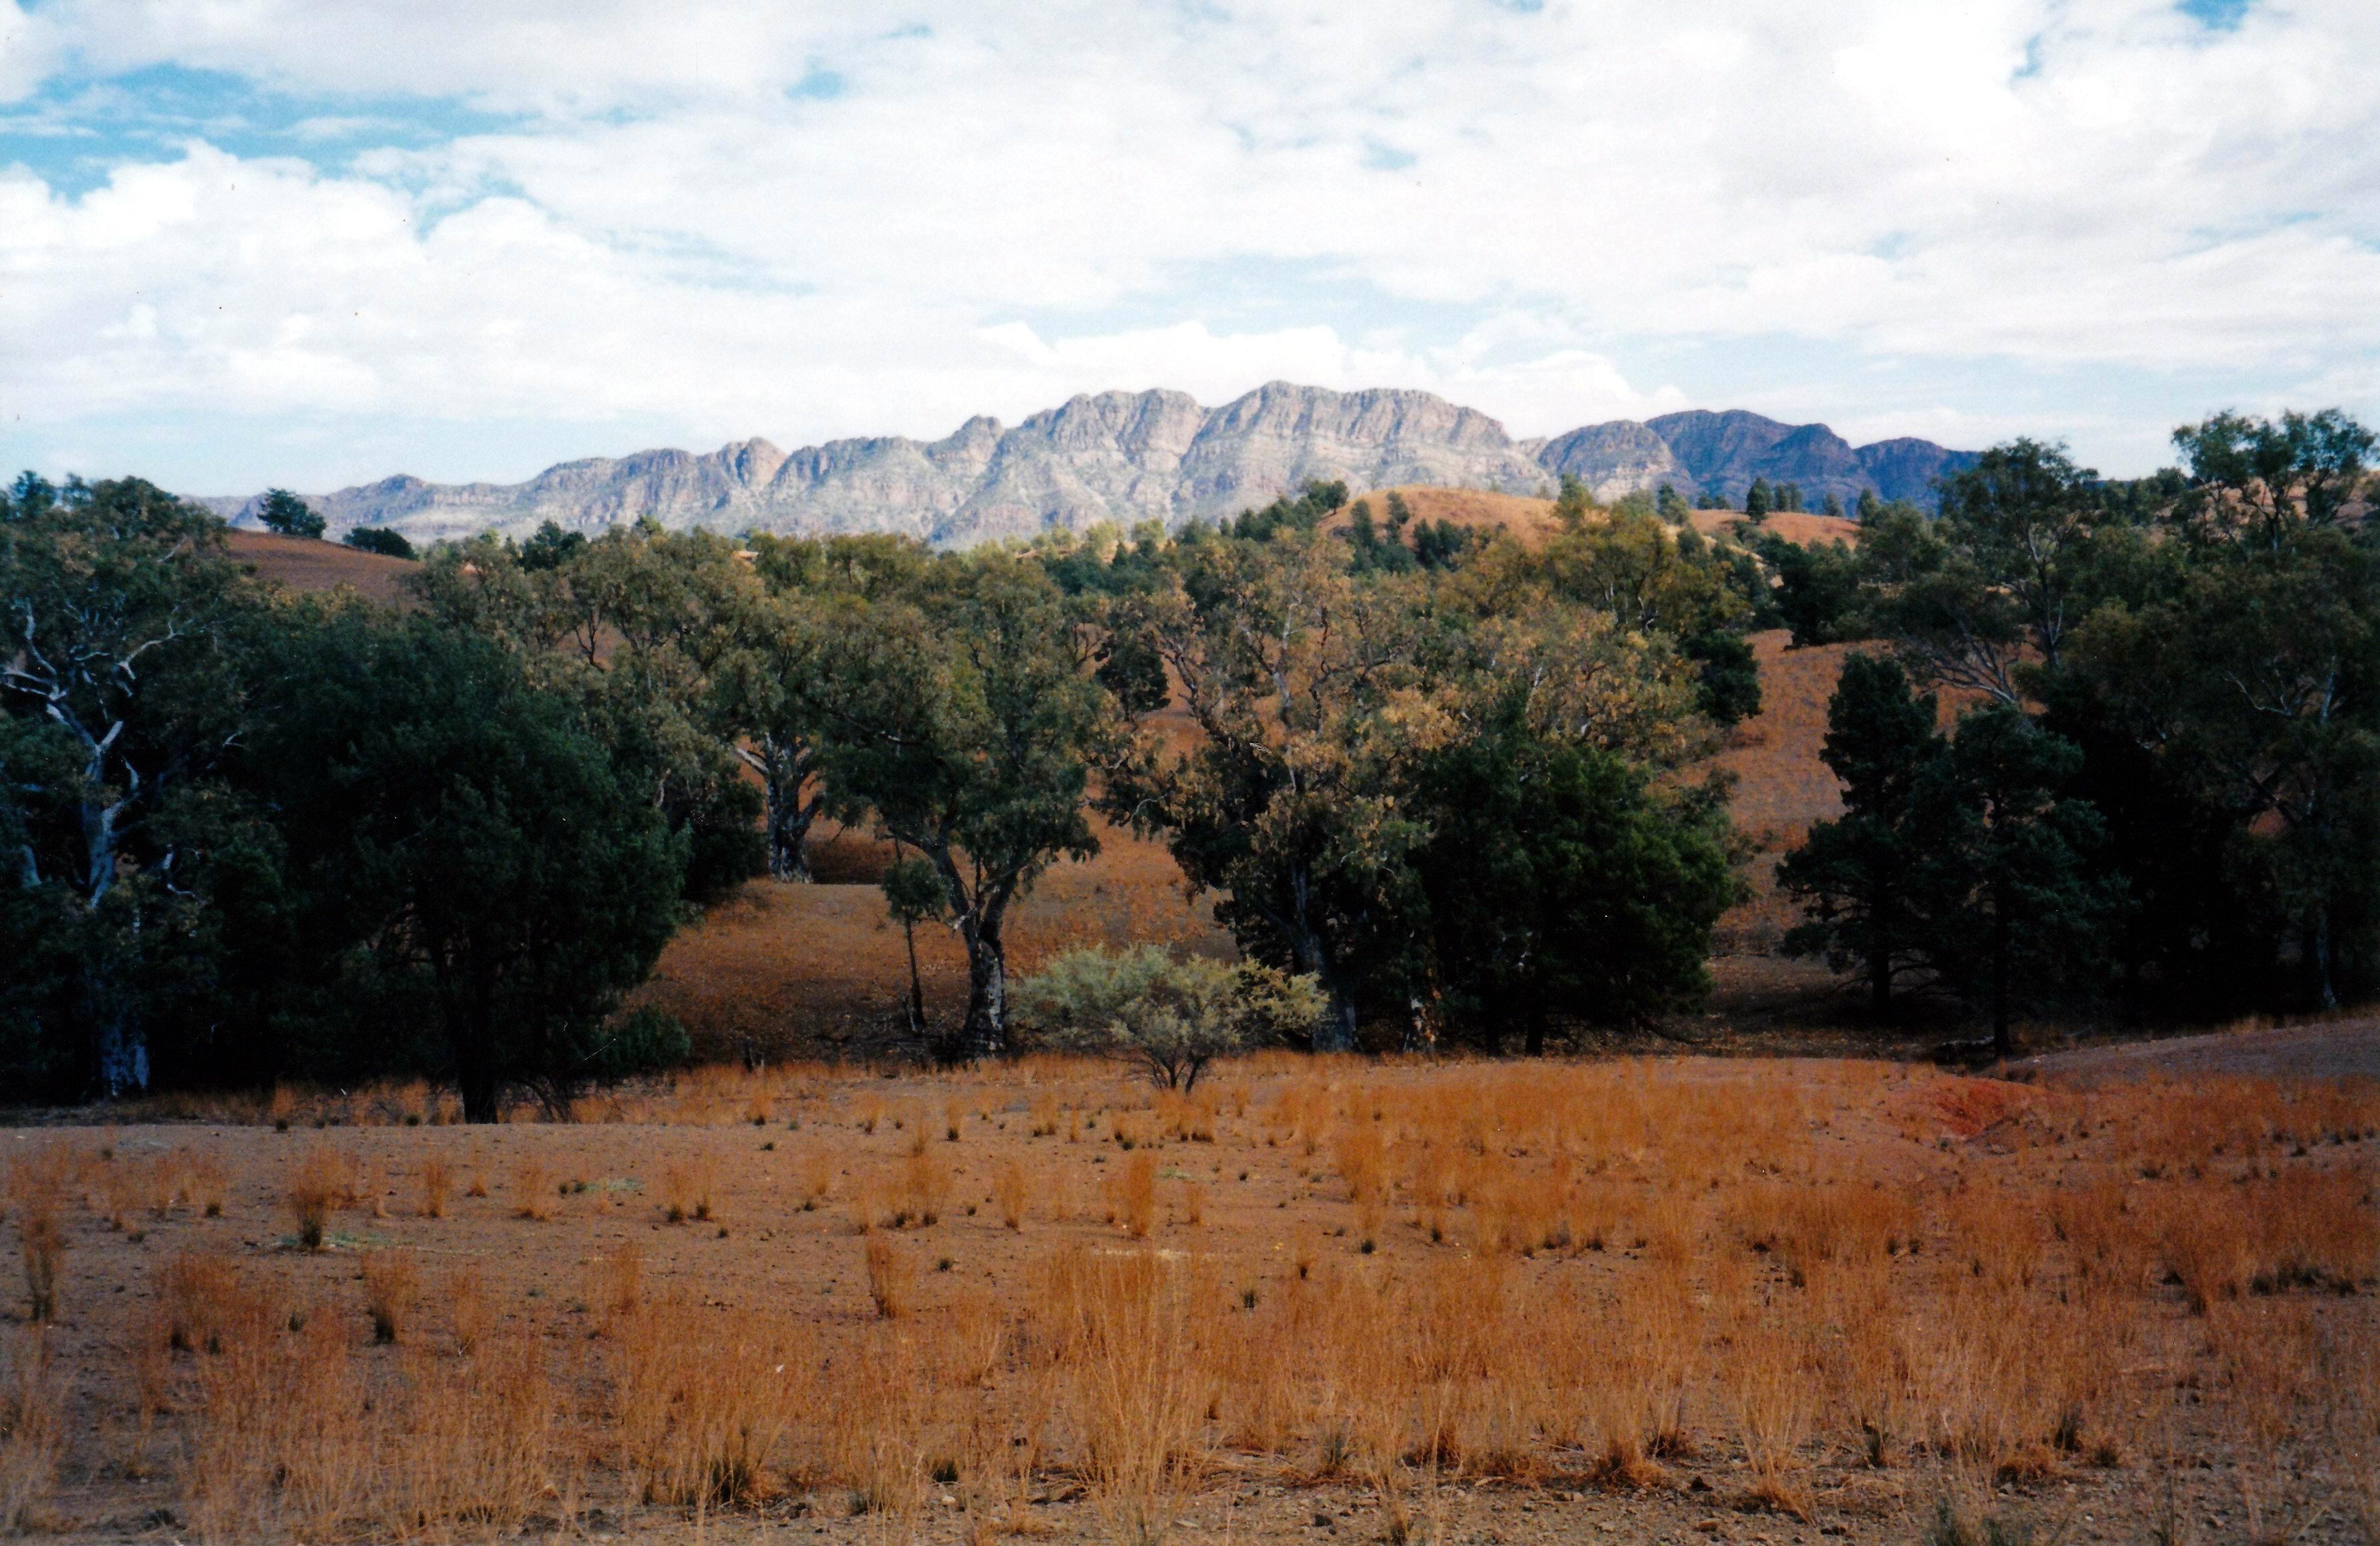 05-19-1999 01 Elder Range from Moralana track